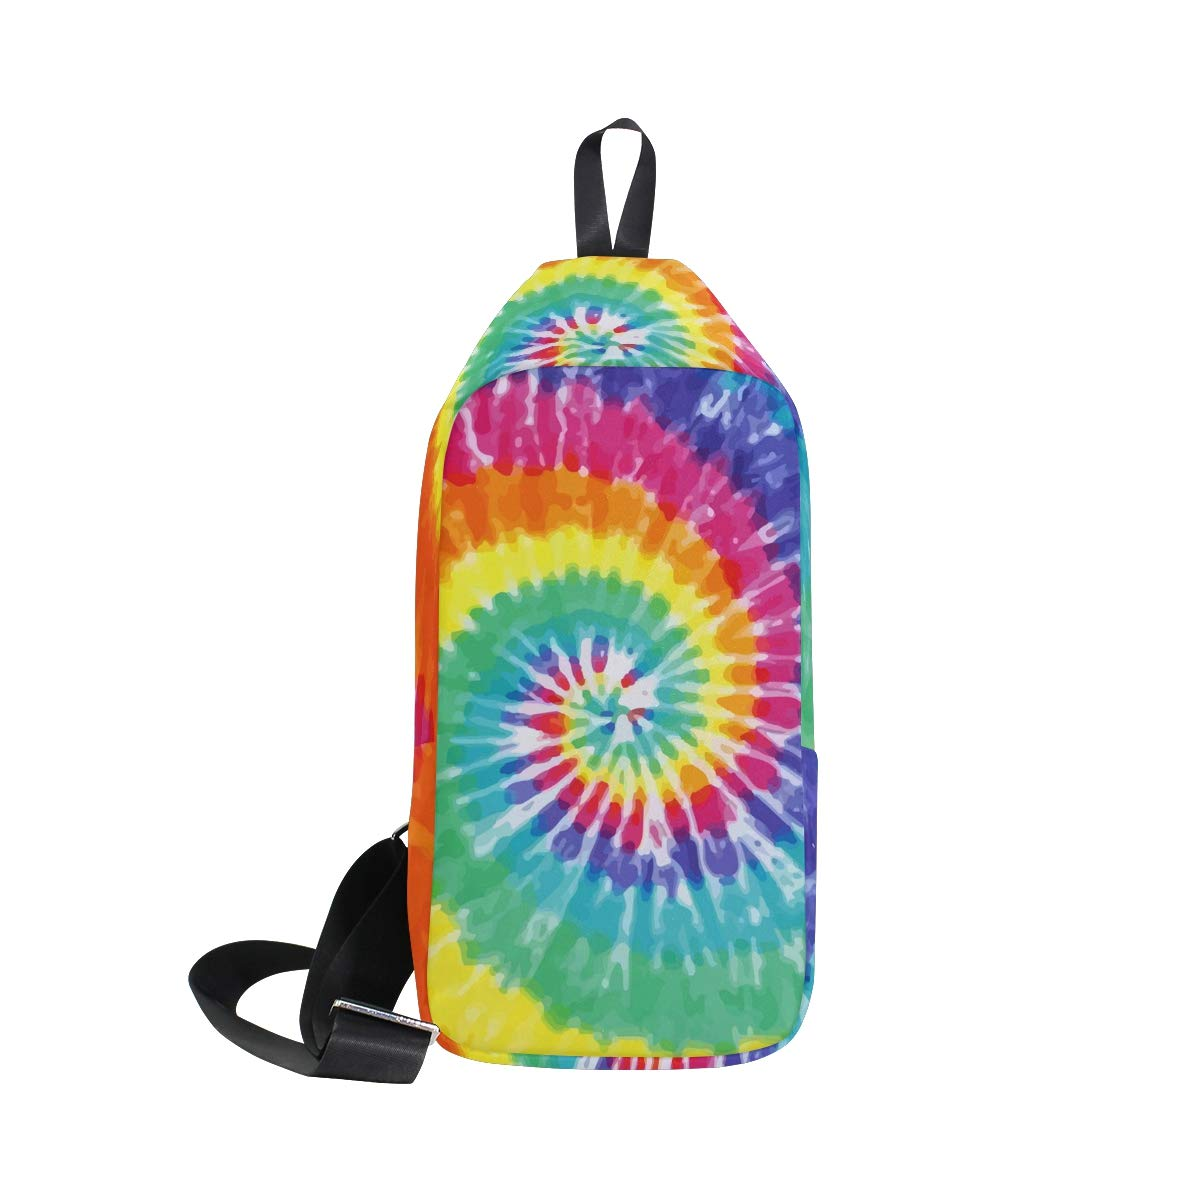 TFONE Abstract Tie Dye Design Crossbody Bag Lightweight Chest Shoulder Messenger Pack Backpack Sling Bag